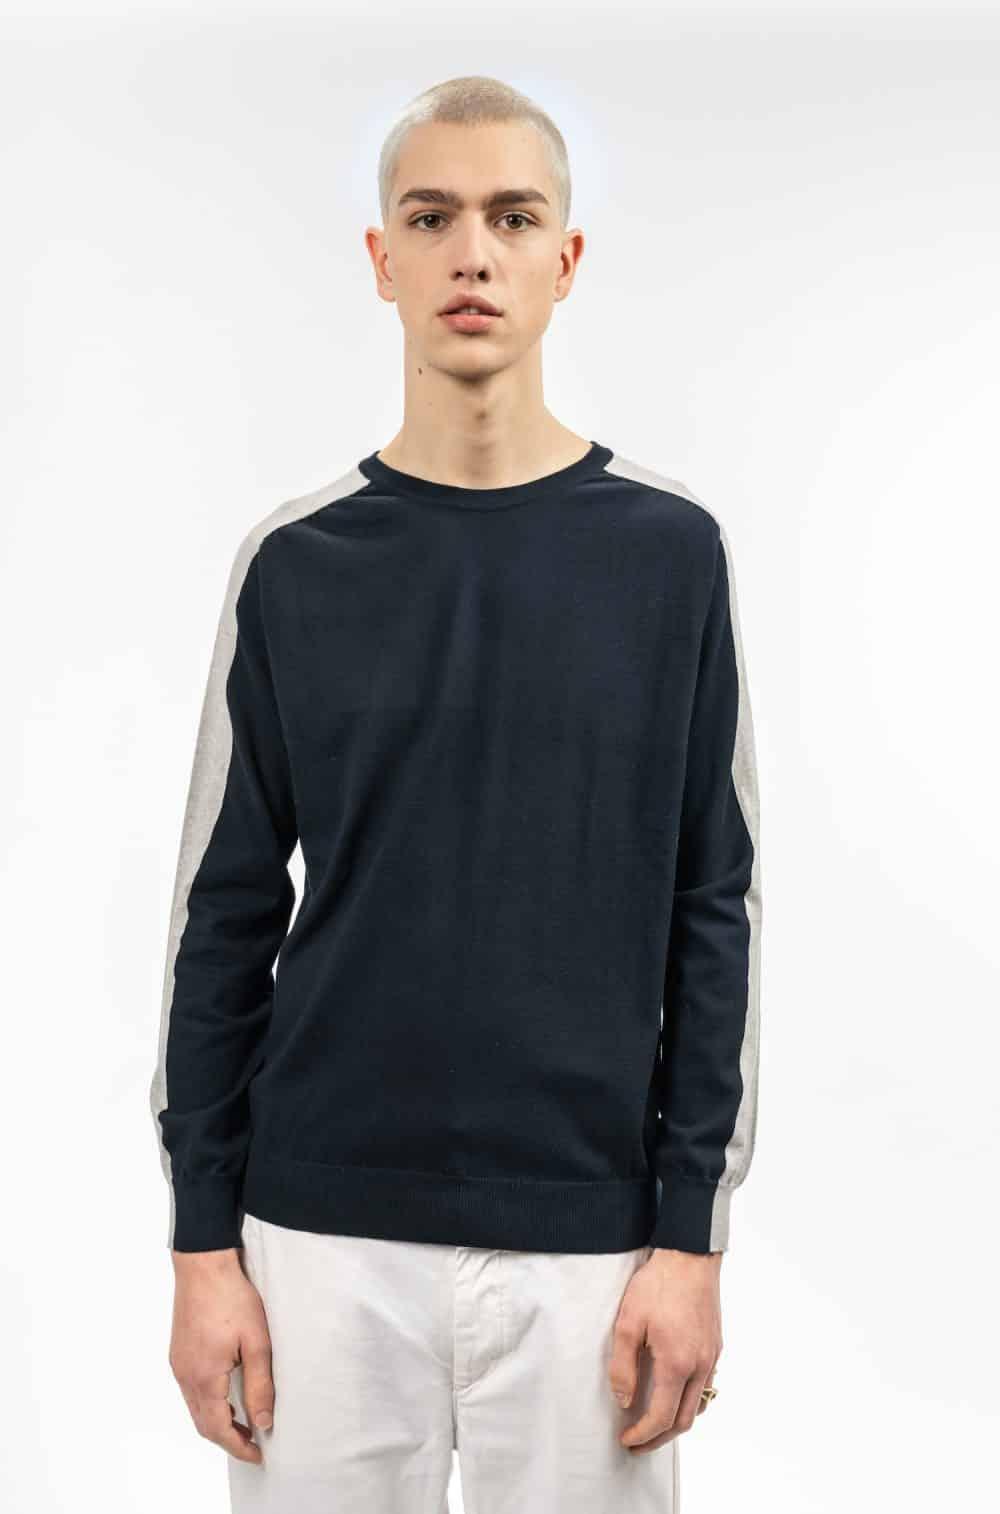 Castart Flatbush Knitwear SS19